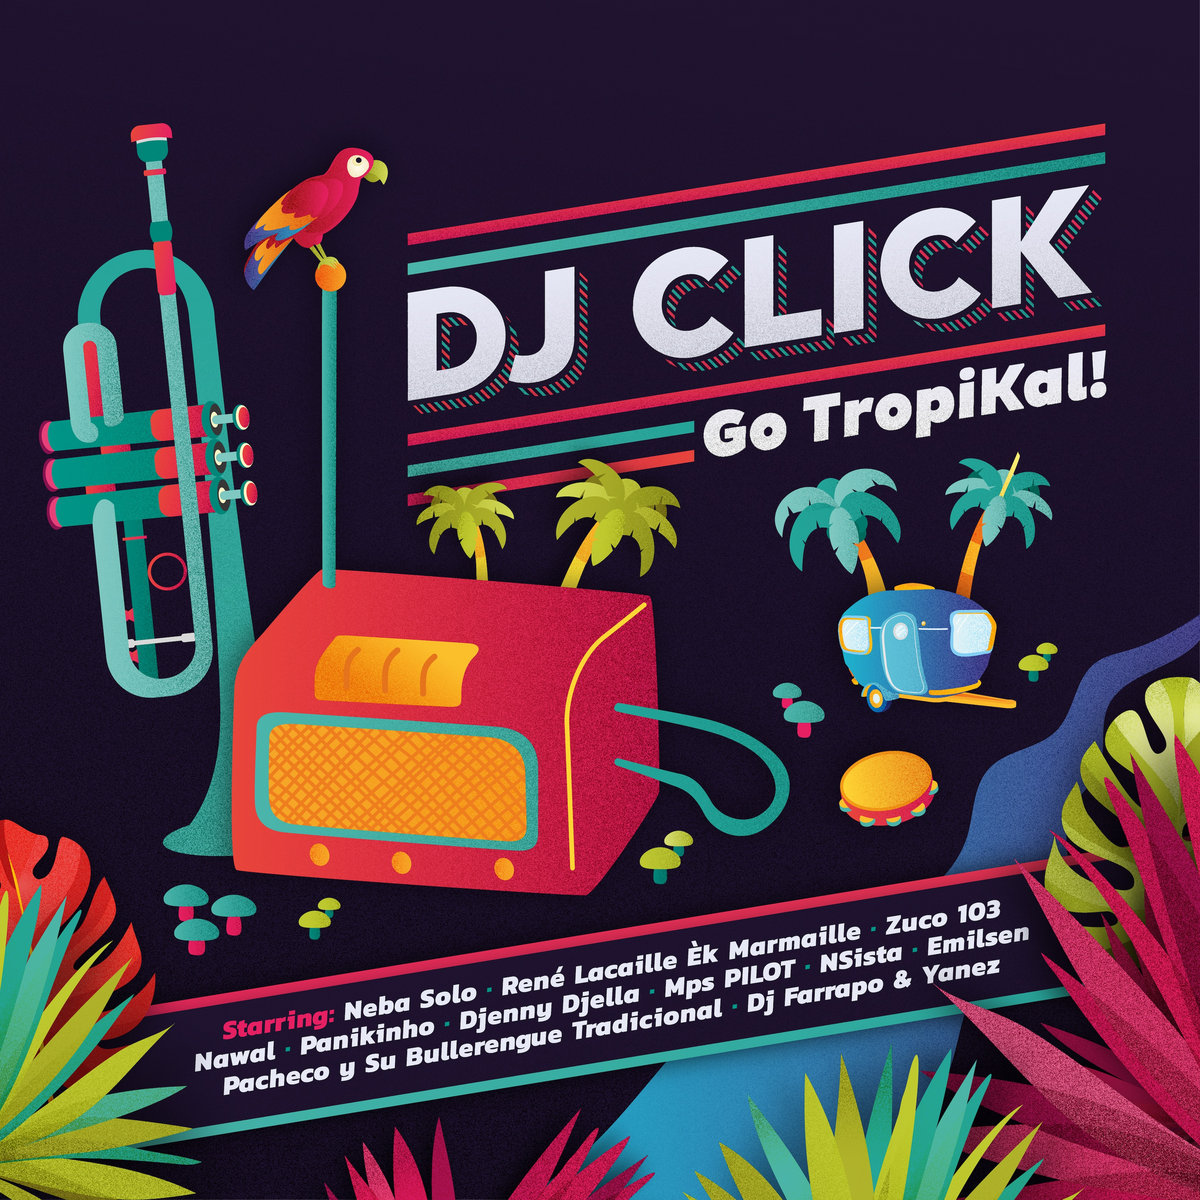 acapella free downloads dj